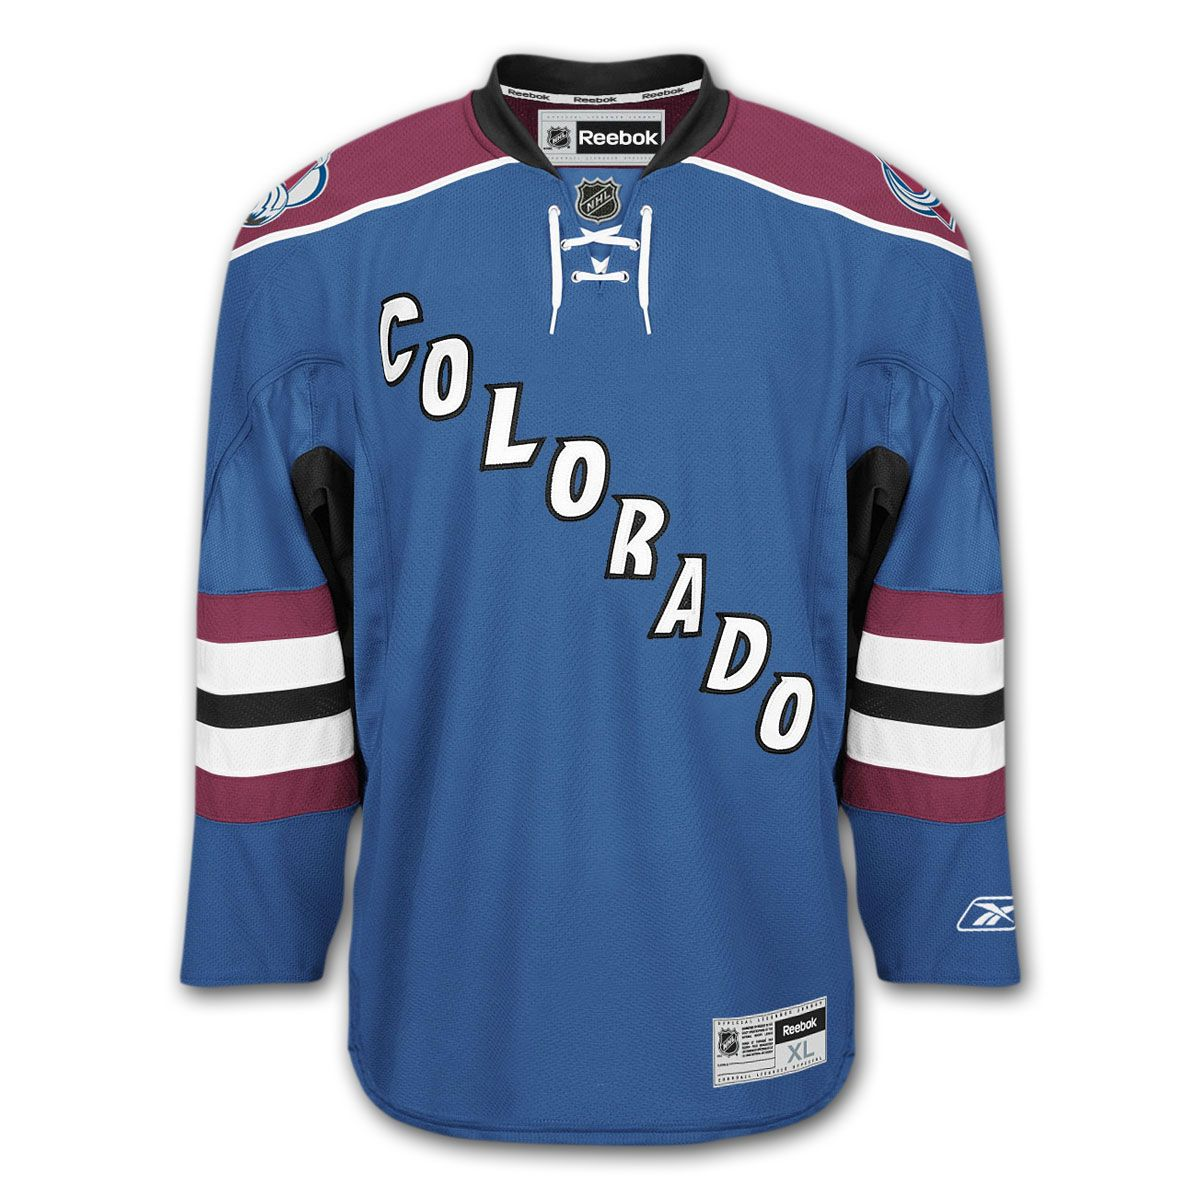 6d429965e0b sale avsjerseyhistory a62d3 87509  promo code colorado avalanche reebok  premier youth replica alternate nhl hockey jersey 0454a 2b8f7